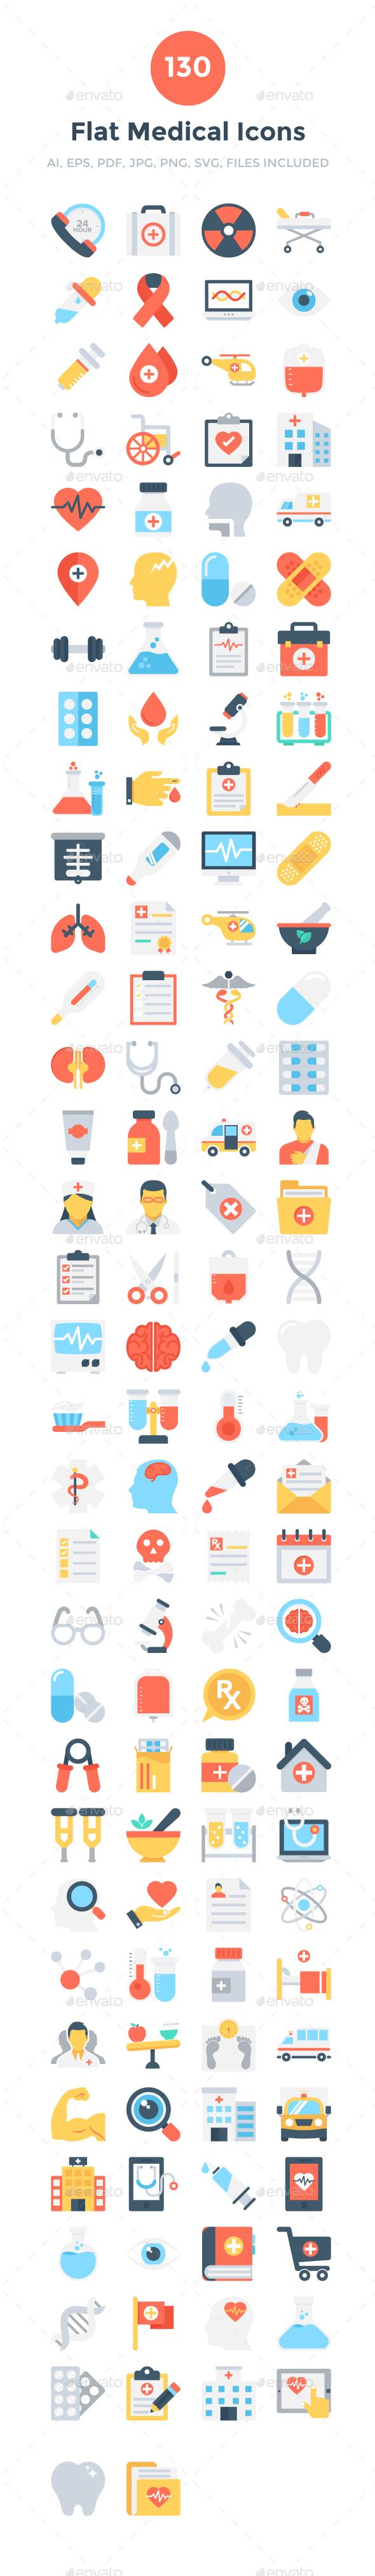 130 Flat Medical Icons - Icons